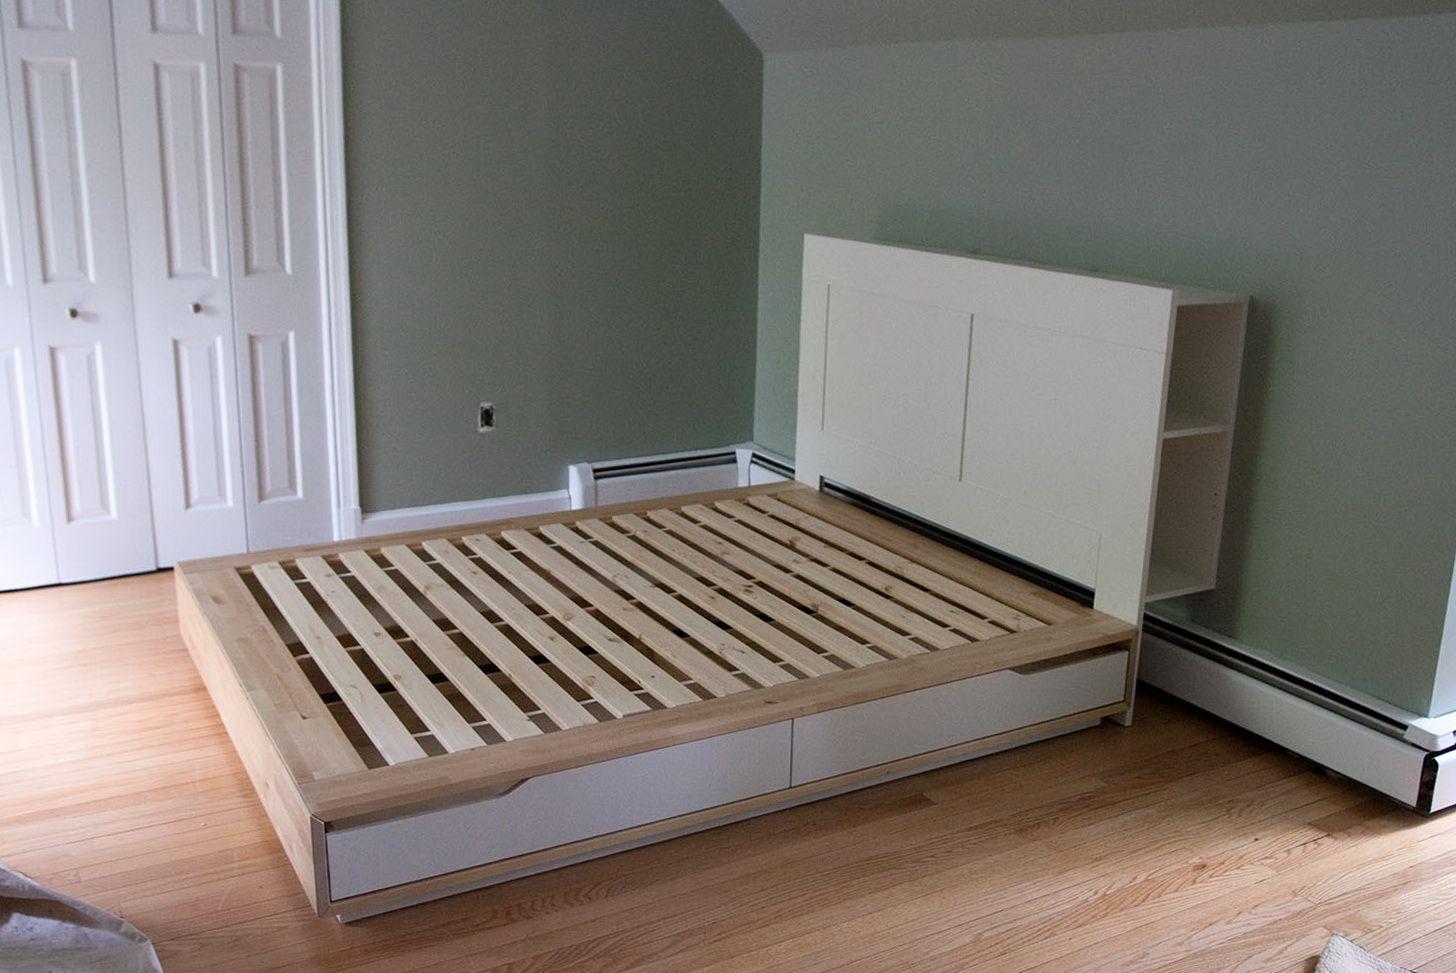 Bed Sample Divan In 2019 Ikea Mandal Headboard Brimnes Bed